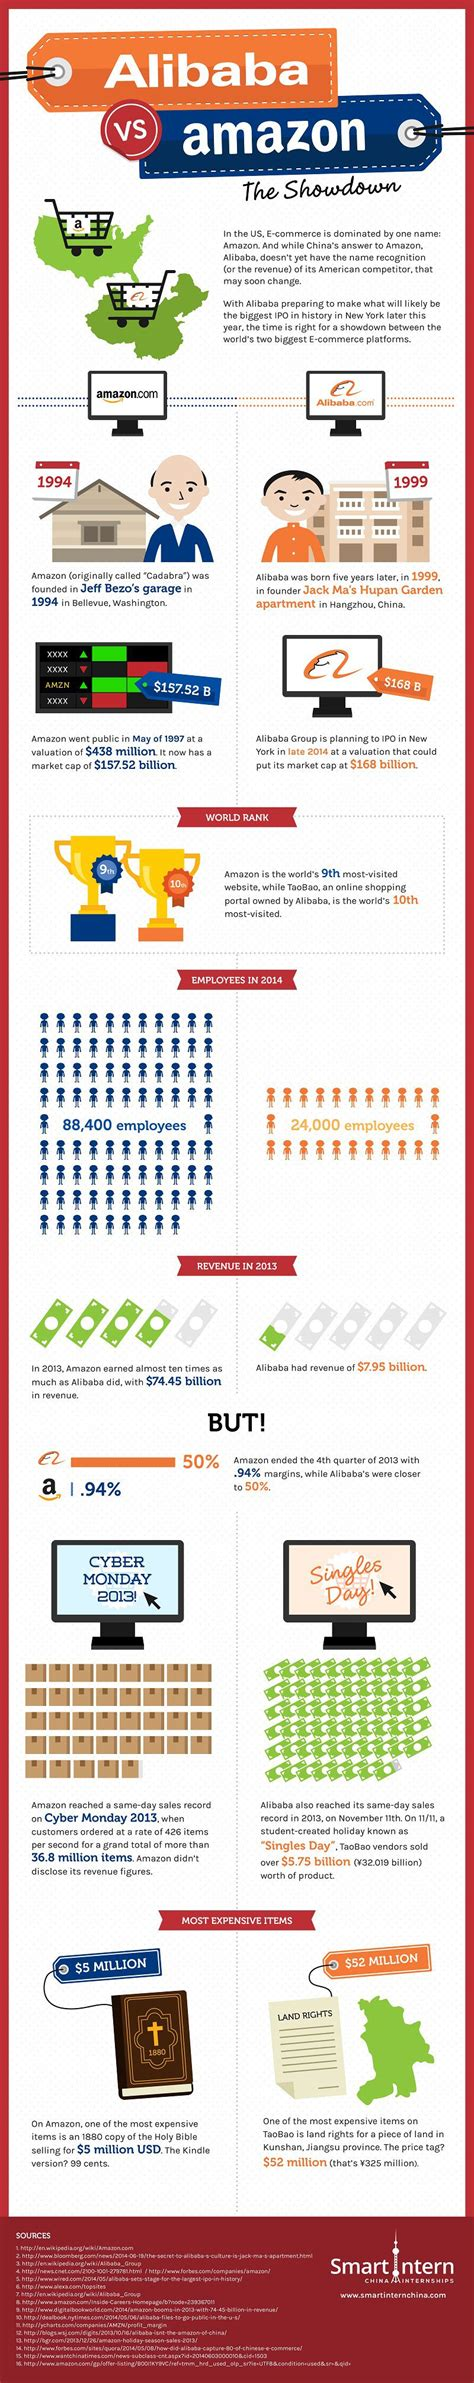 alibaba internship amazon vs alibaba the showdown infographic